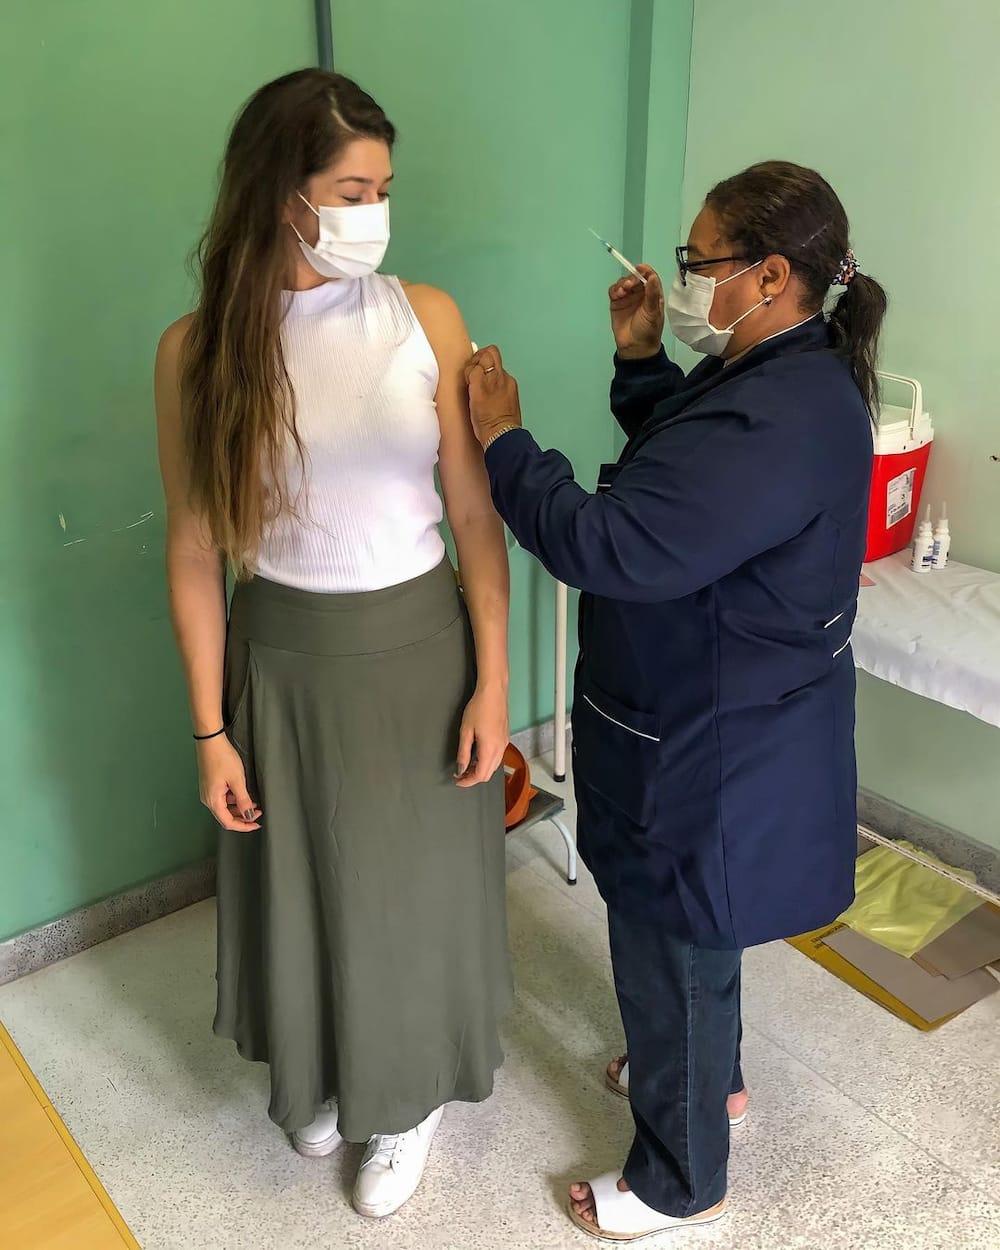 How COVID-19 Vaccine AstraZeneca is given?